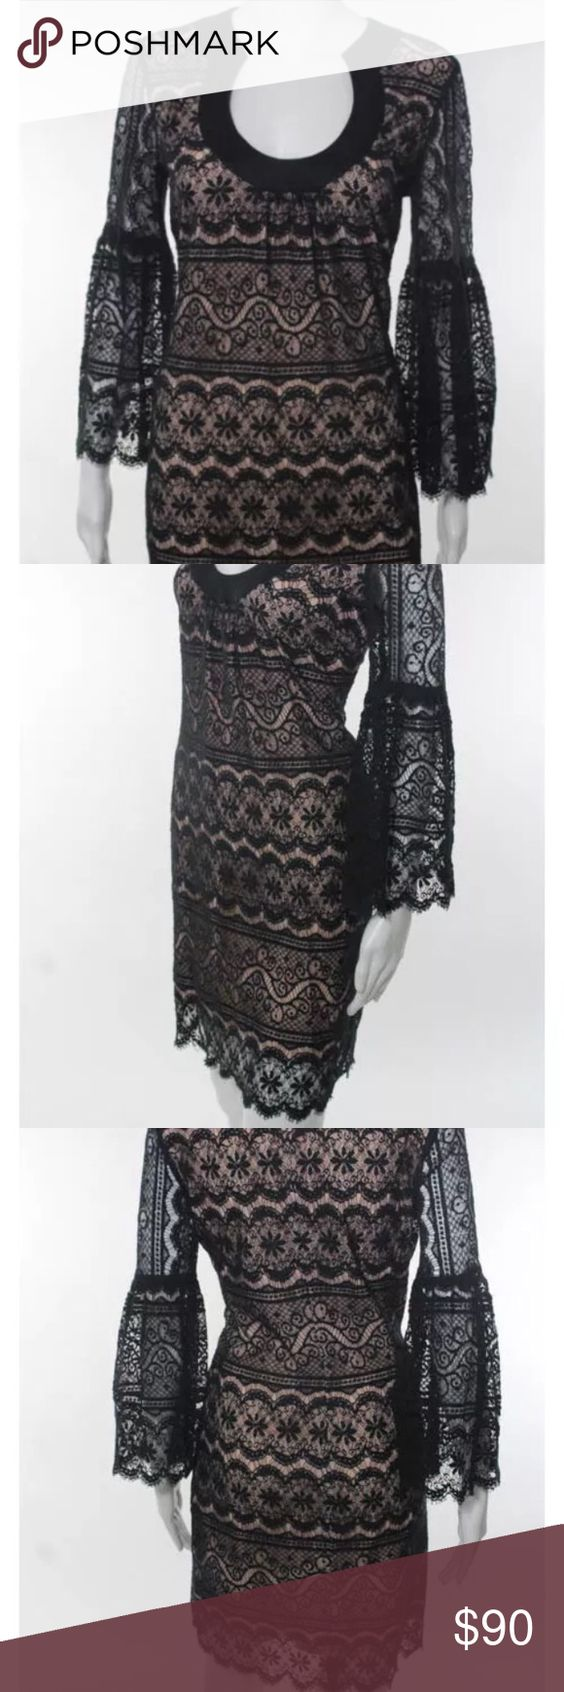 Trina Turk Dress Black Cotton Lace Dress Trina Turk Dresses Long Sleeve